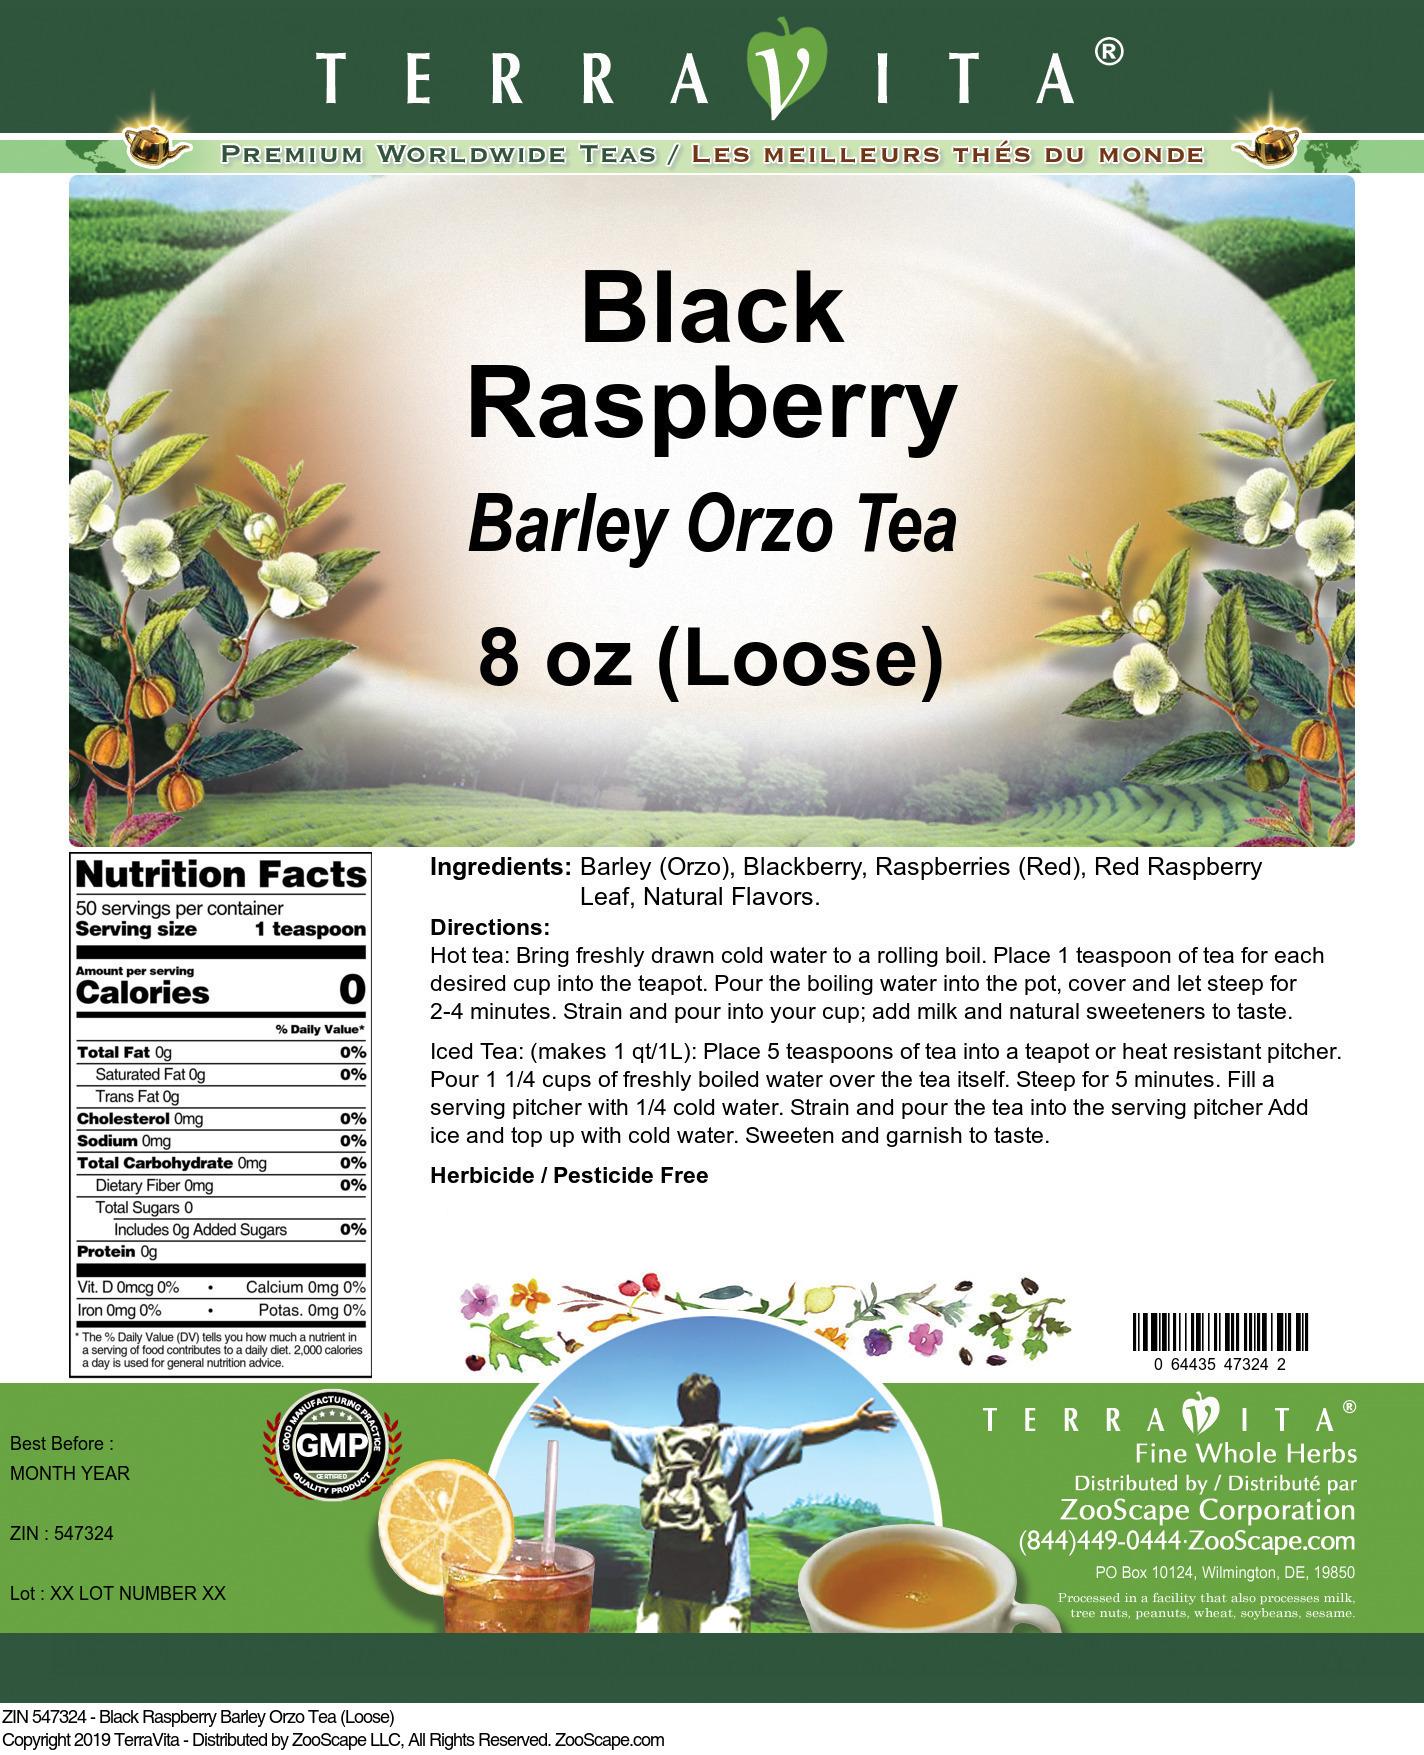 Black Raspberry Barley Orzo Tea (Loose)